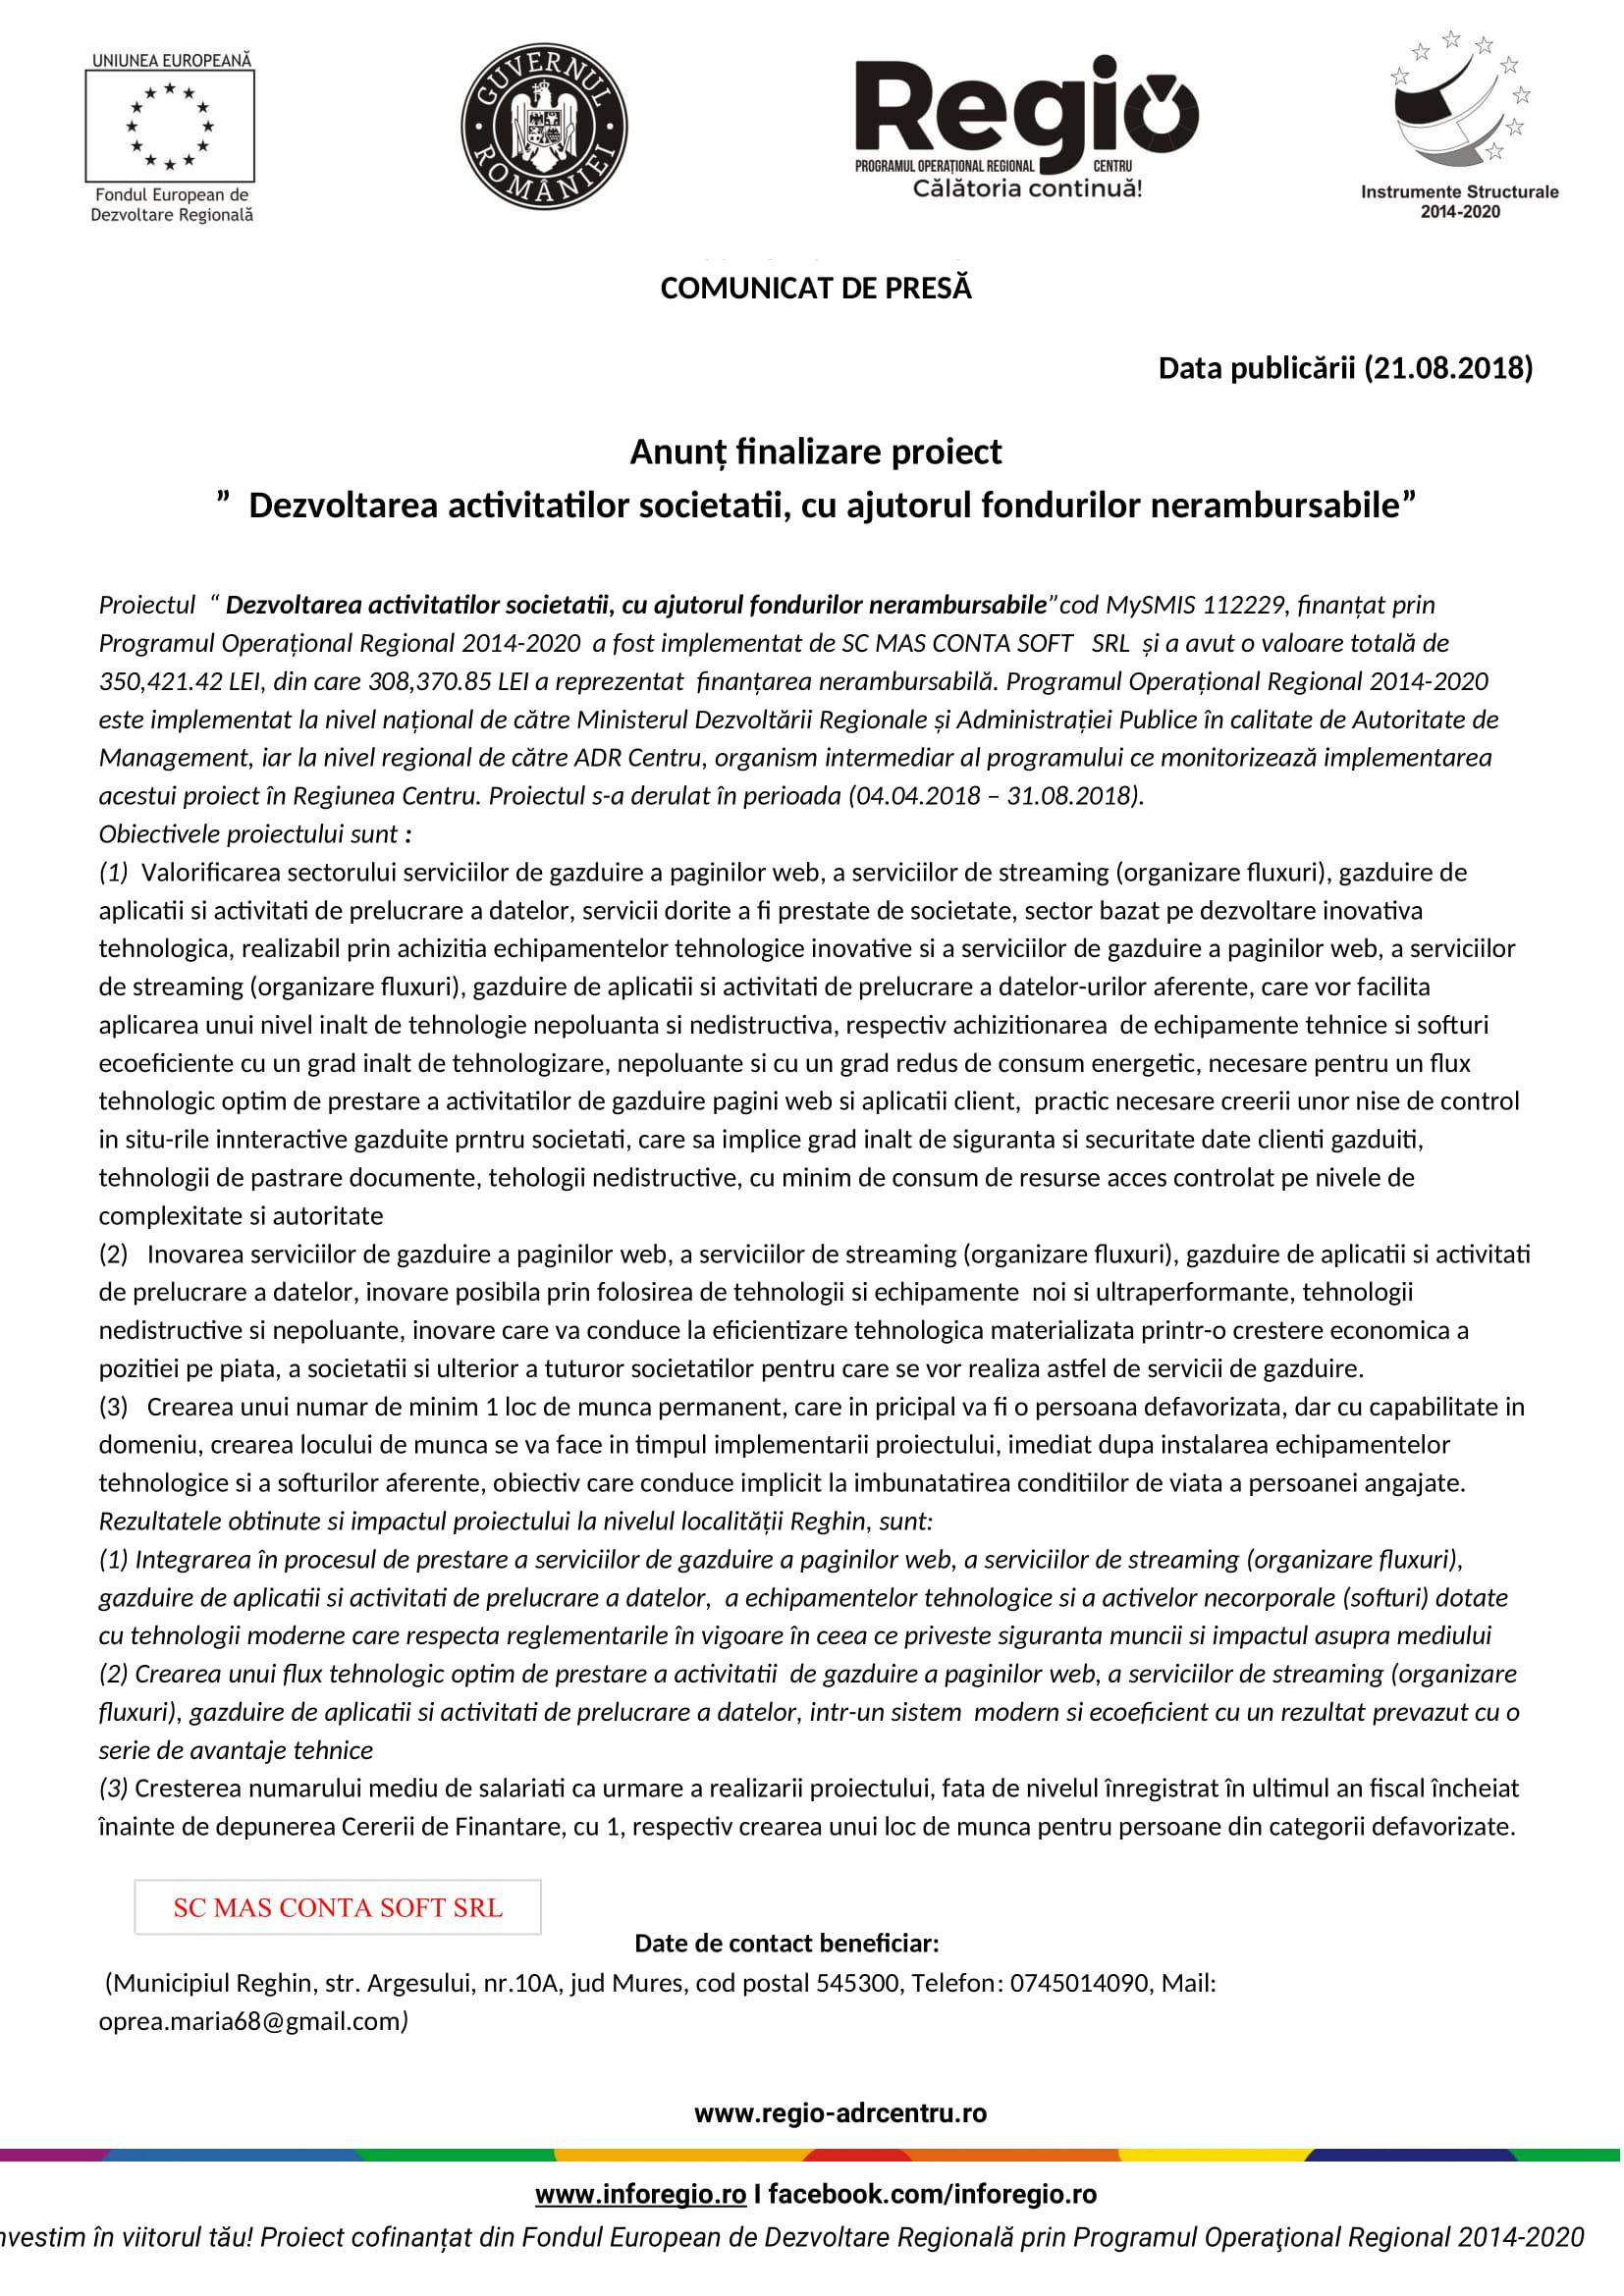 1-2 Comunicat-de-presa-monocrom(1)-1